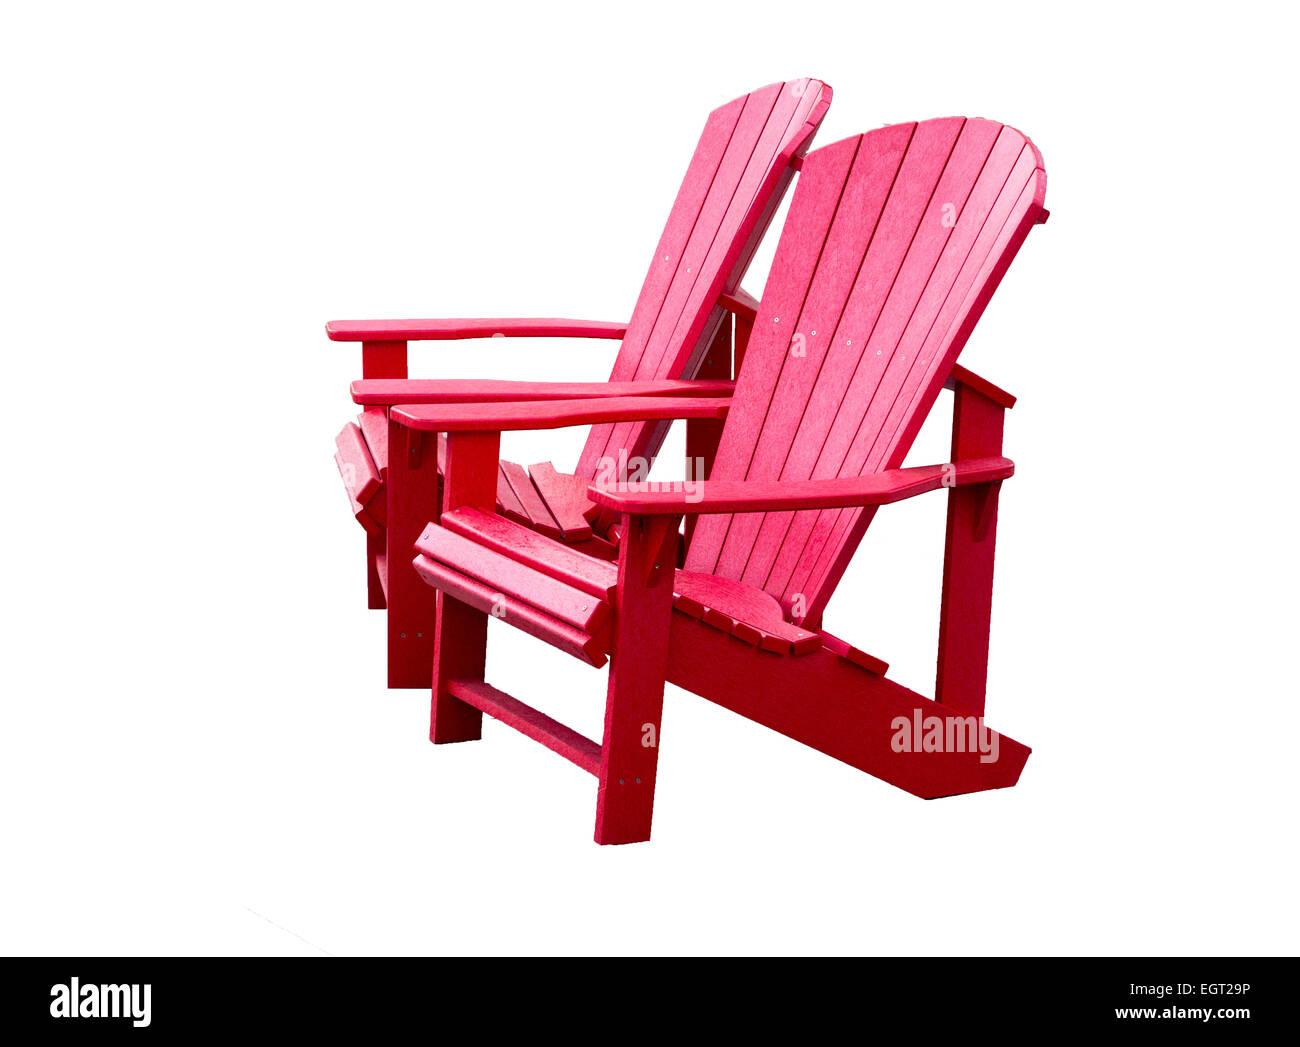 cut-out-of-2-red-muskoka-or-adironadack-